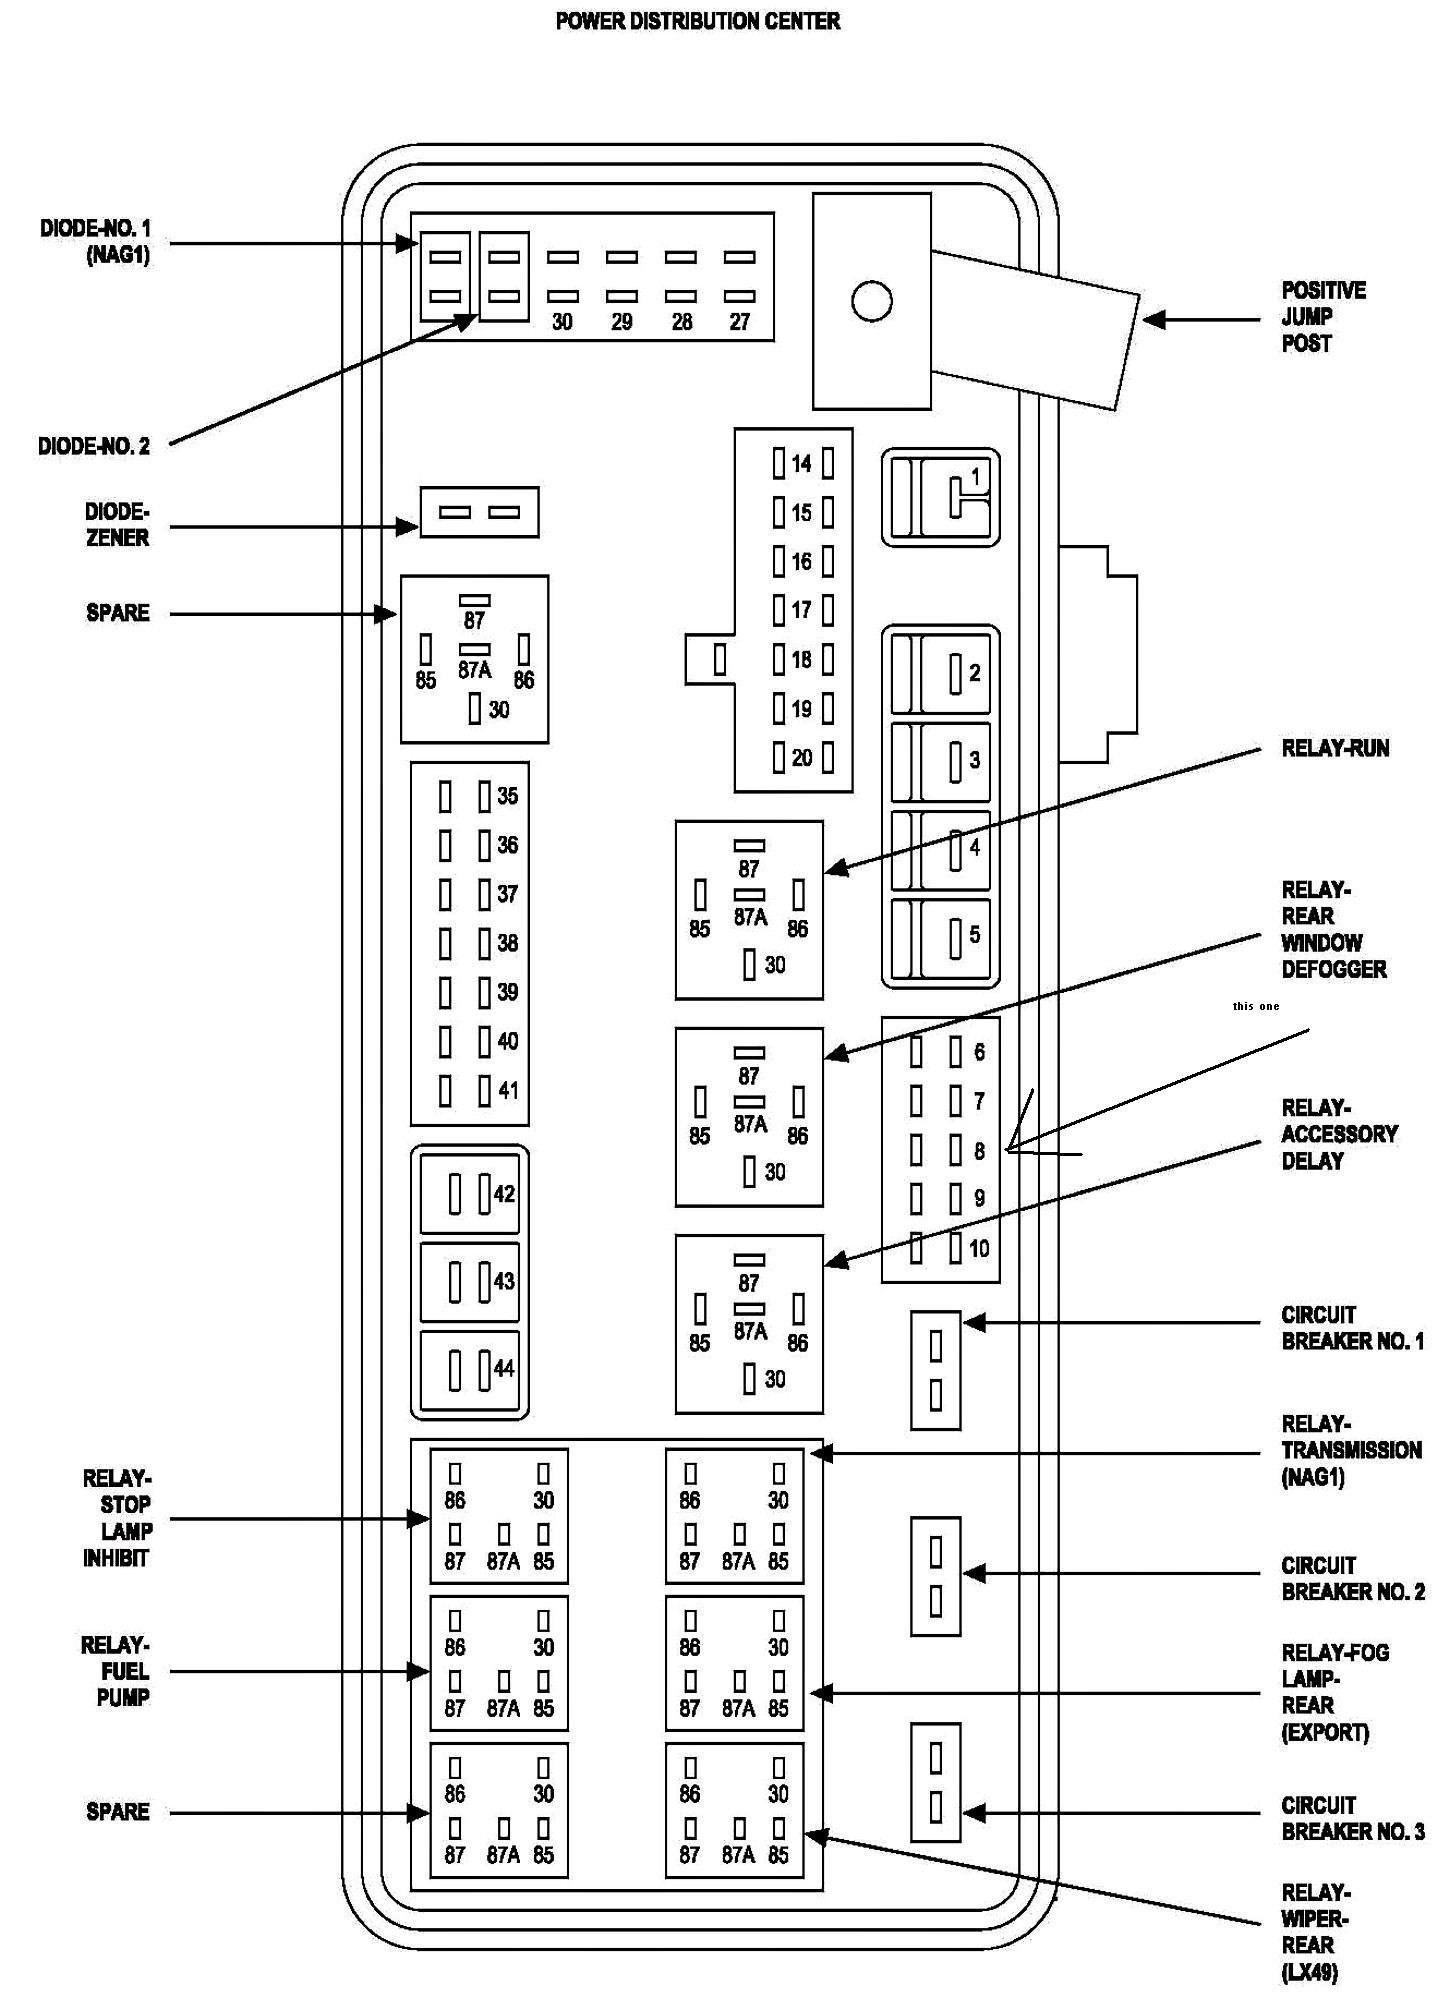 2004 Dodge Ram Wiring Diagram Copy Wiring Diagram 2007 Dodge Ram 1500 Fresh Car Wiring 2004 Dodge Ram